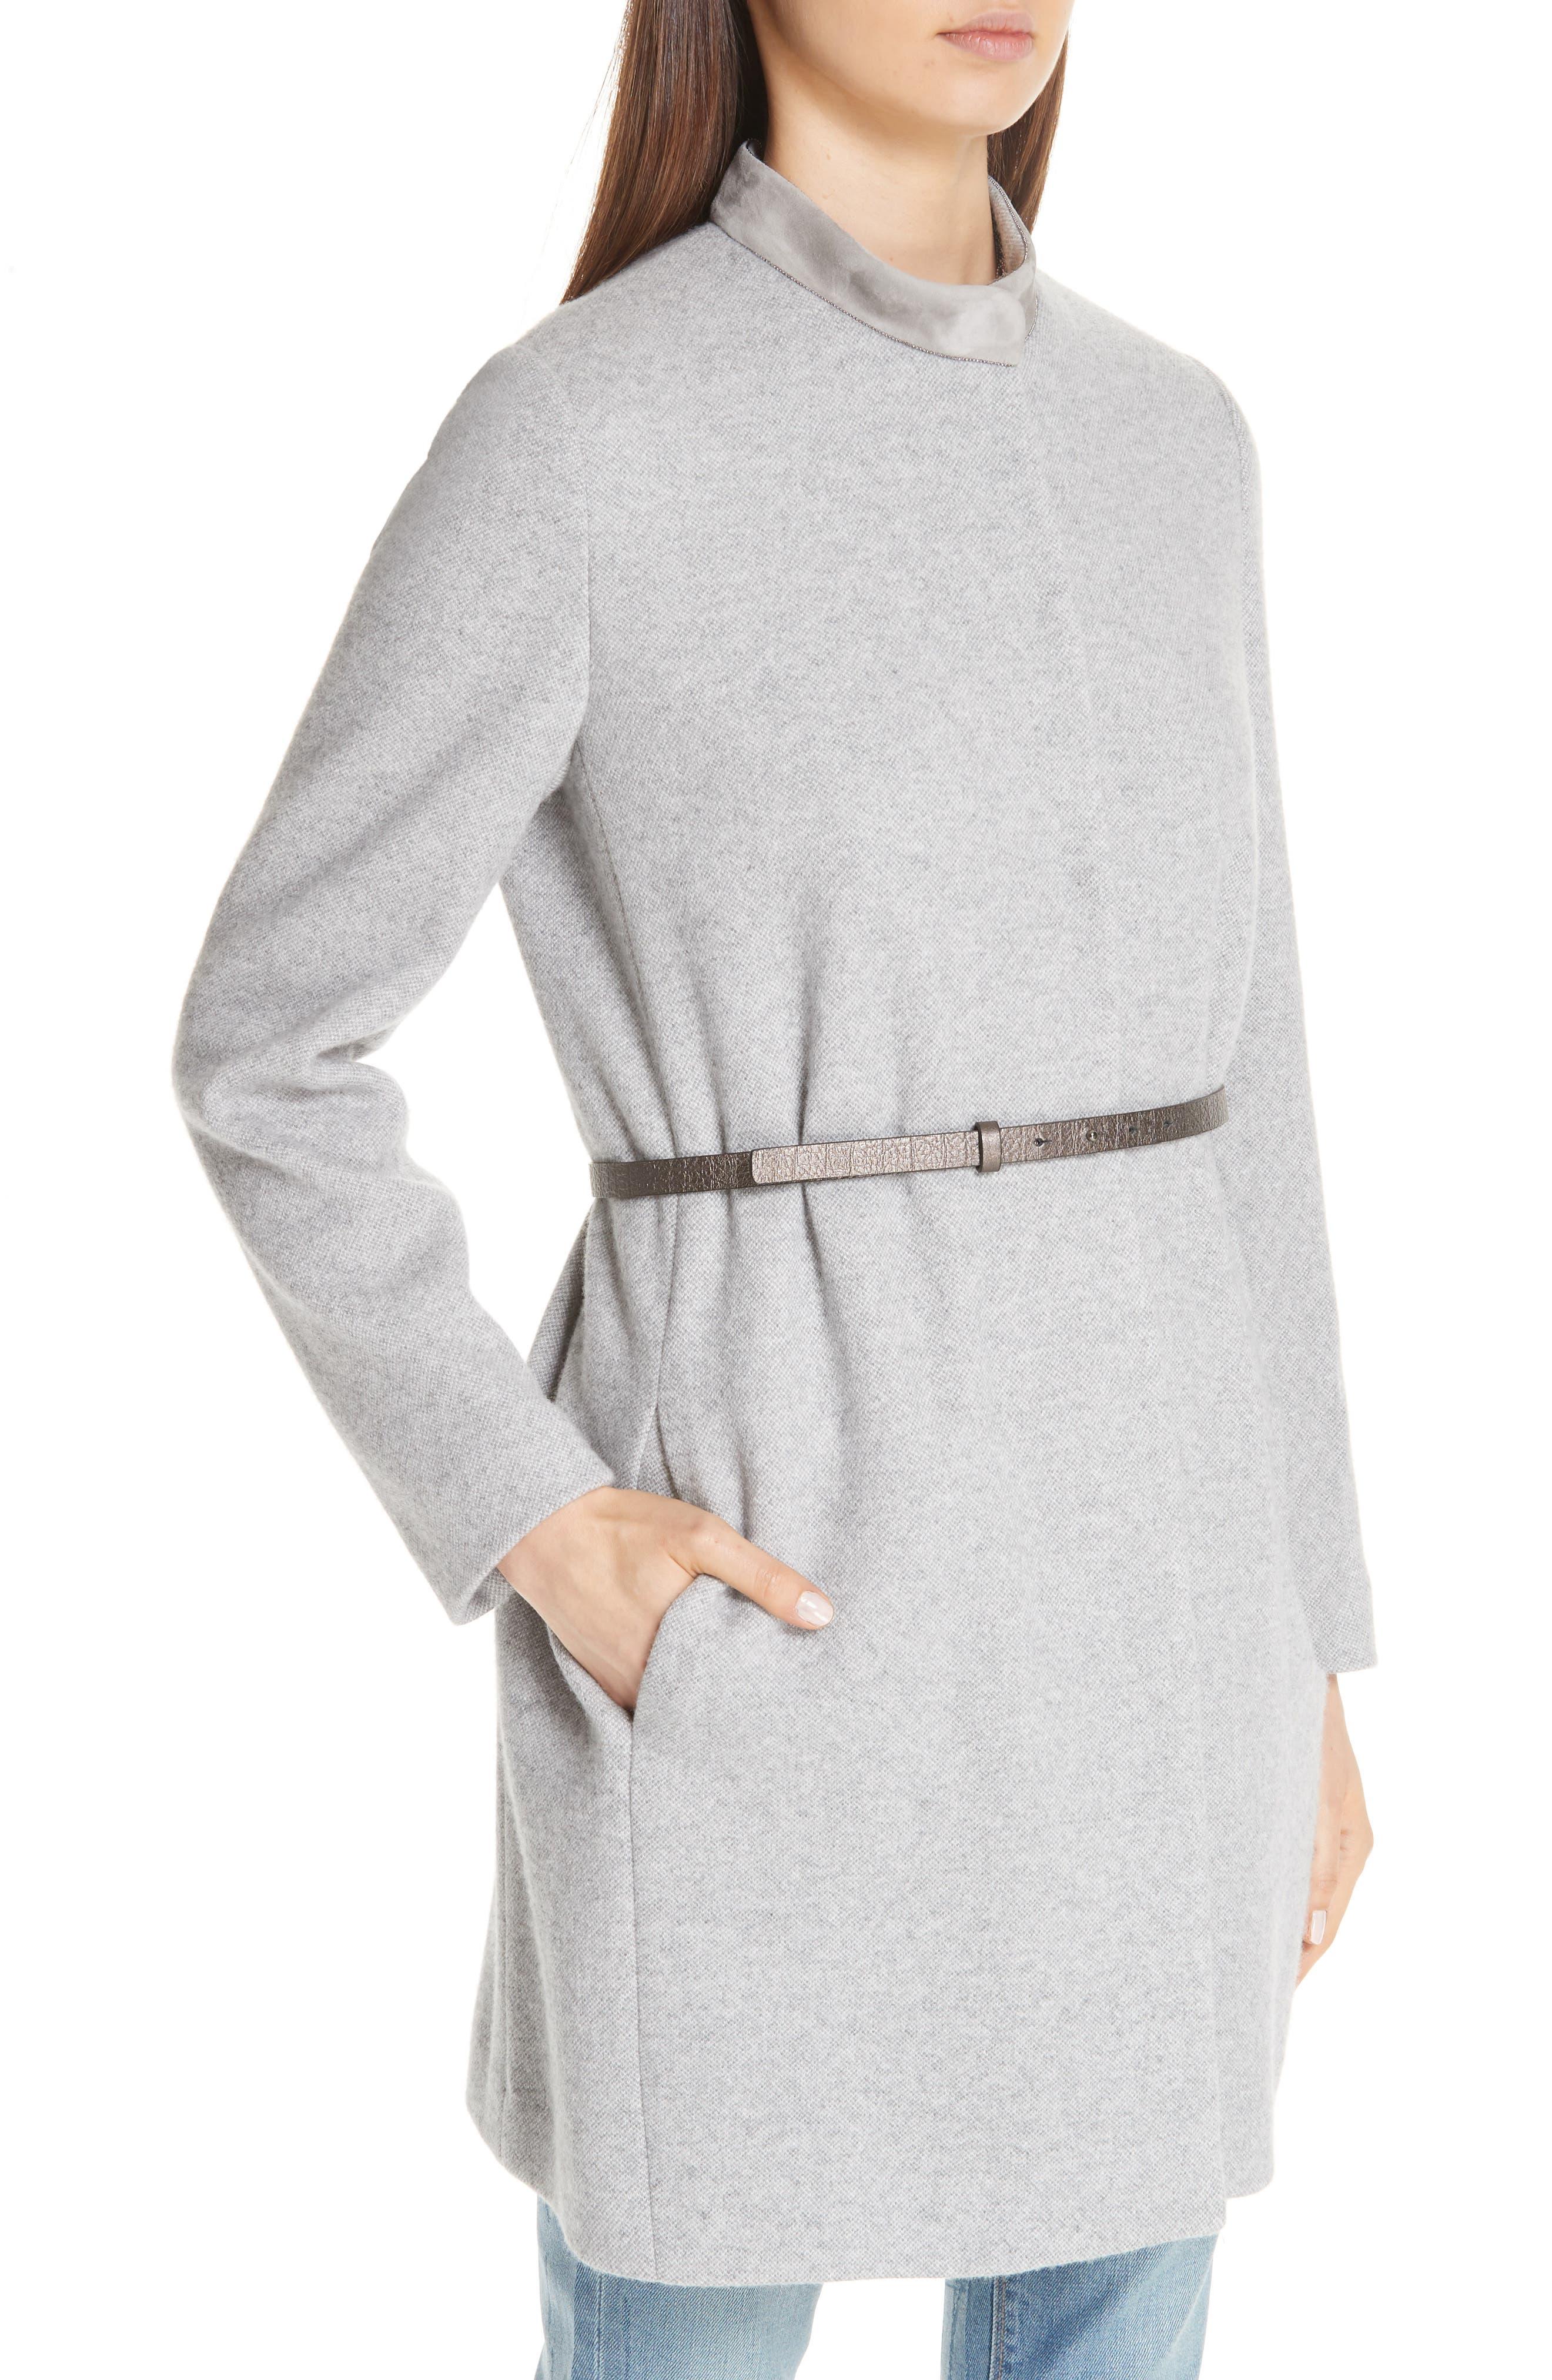 FABIANA FILIPPI,                             Suede Trim Tweed Jacket,                             Alternate thumbnail 4, color,                             GREY